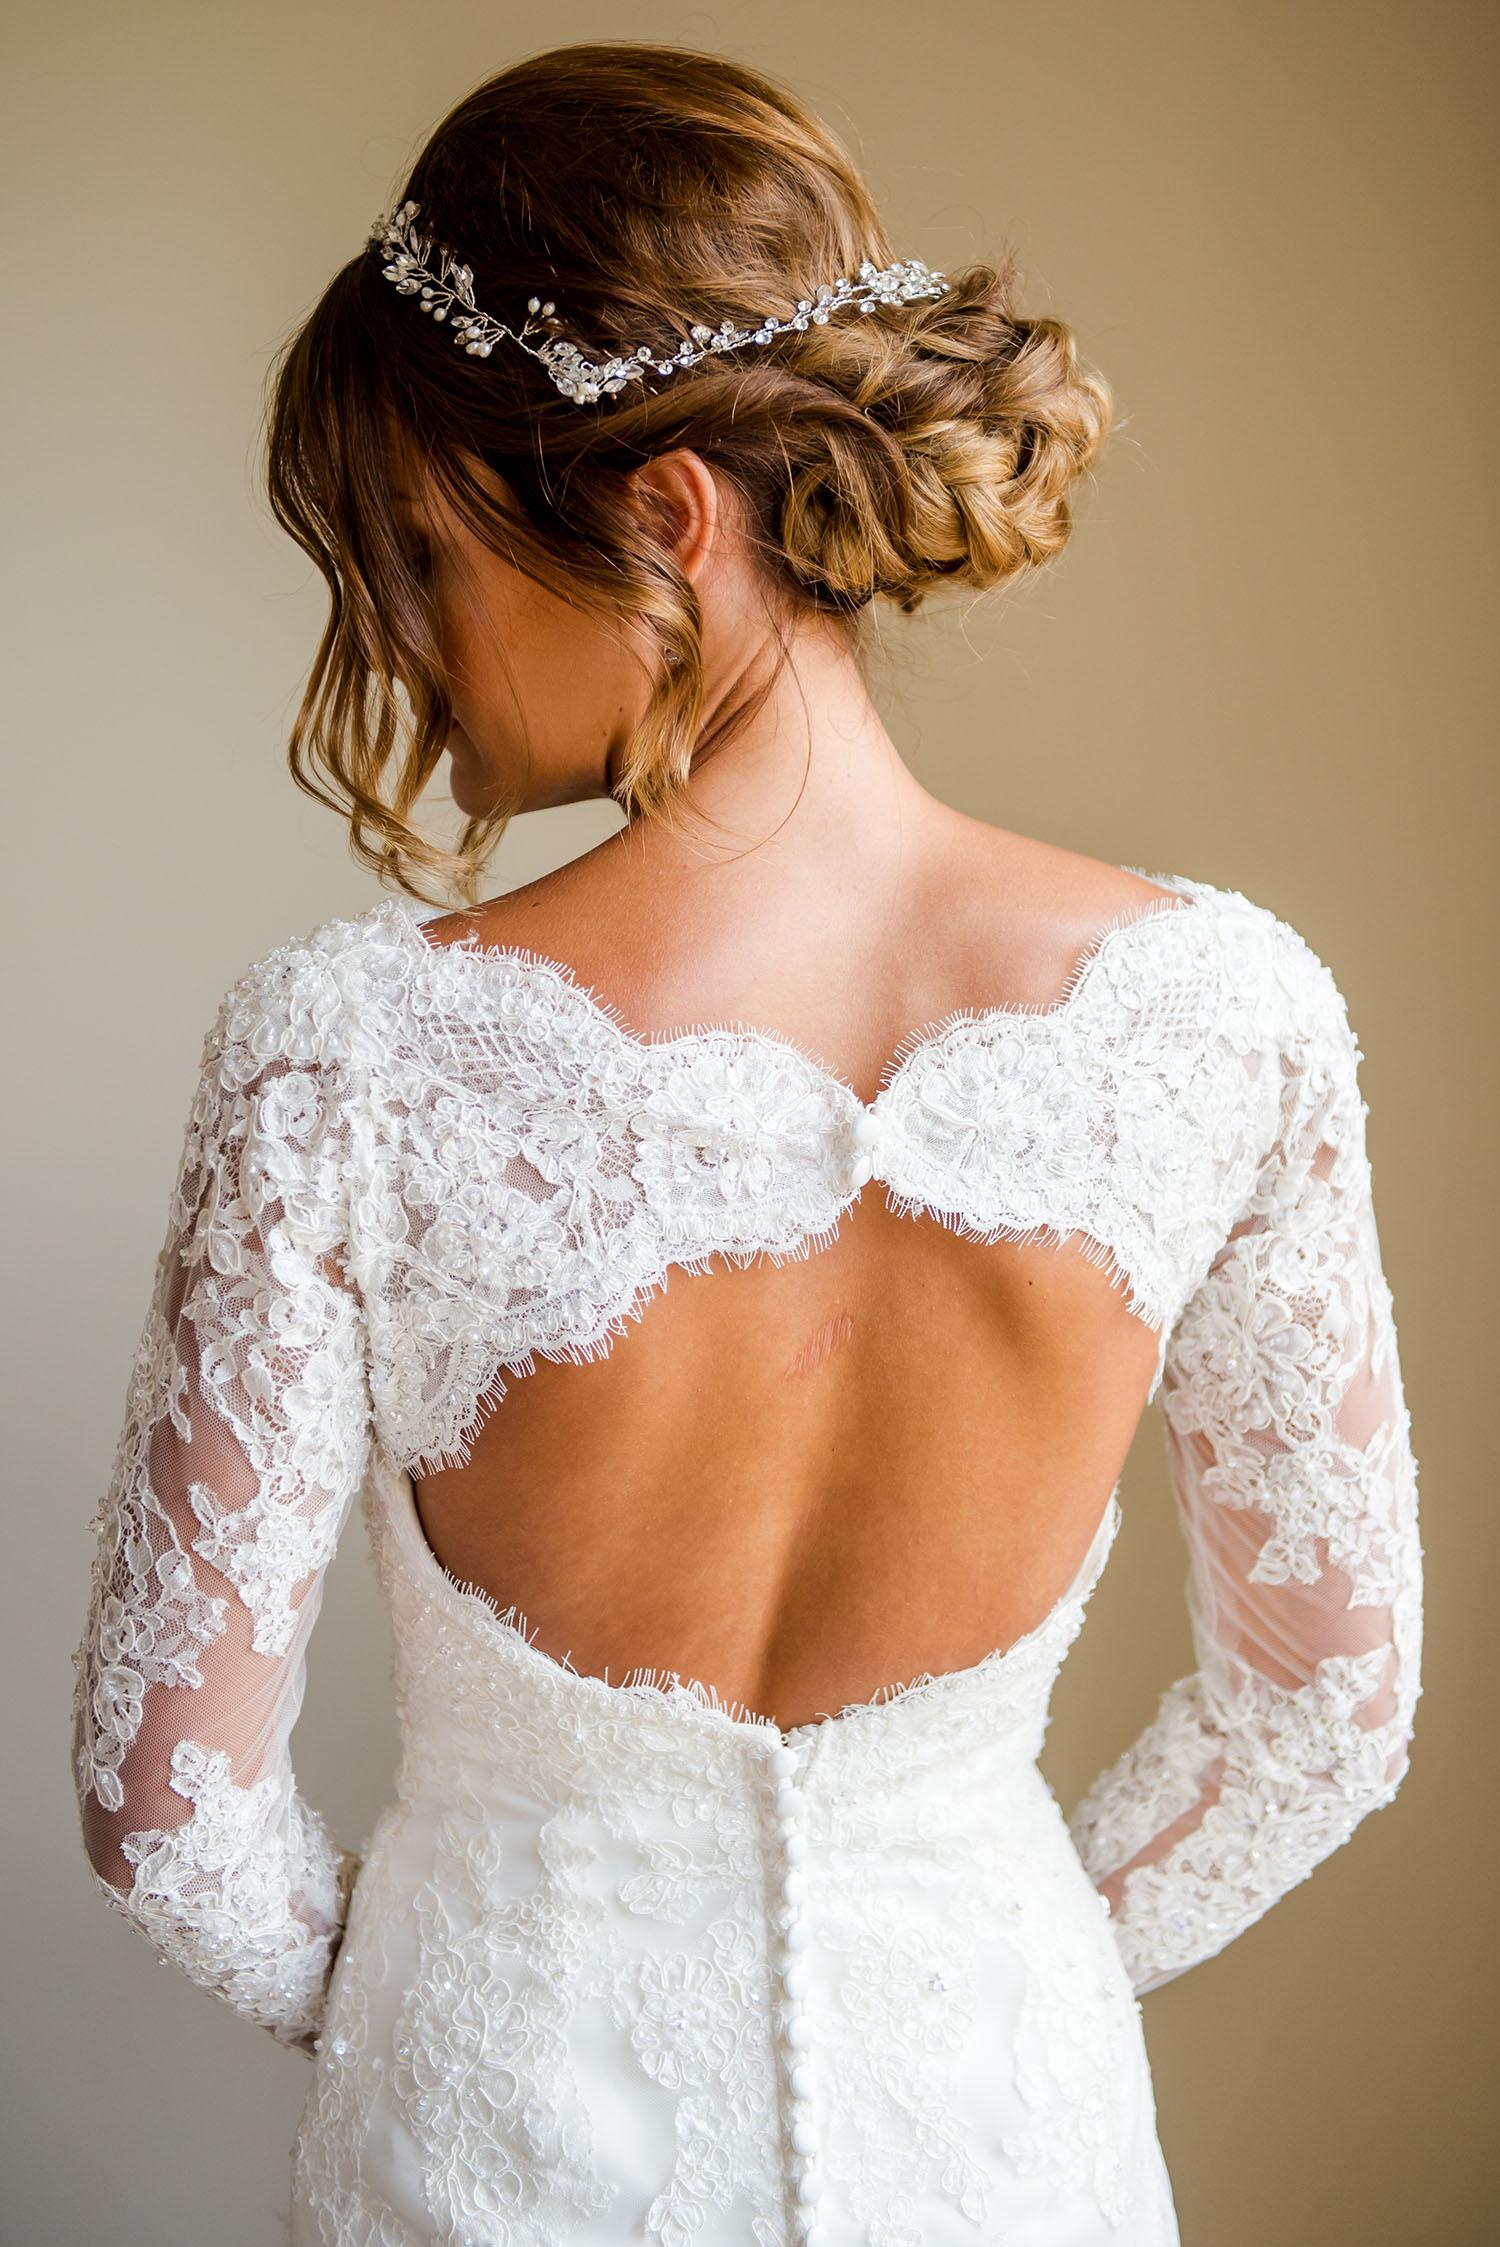 jma-photography-back-bride-dress-yorkshire-photographer.jpg